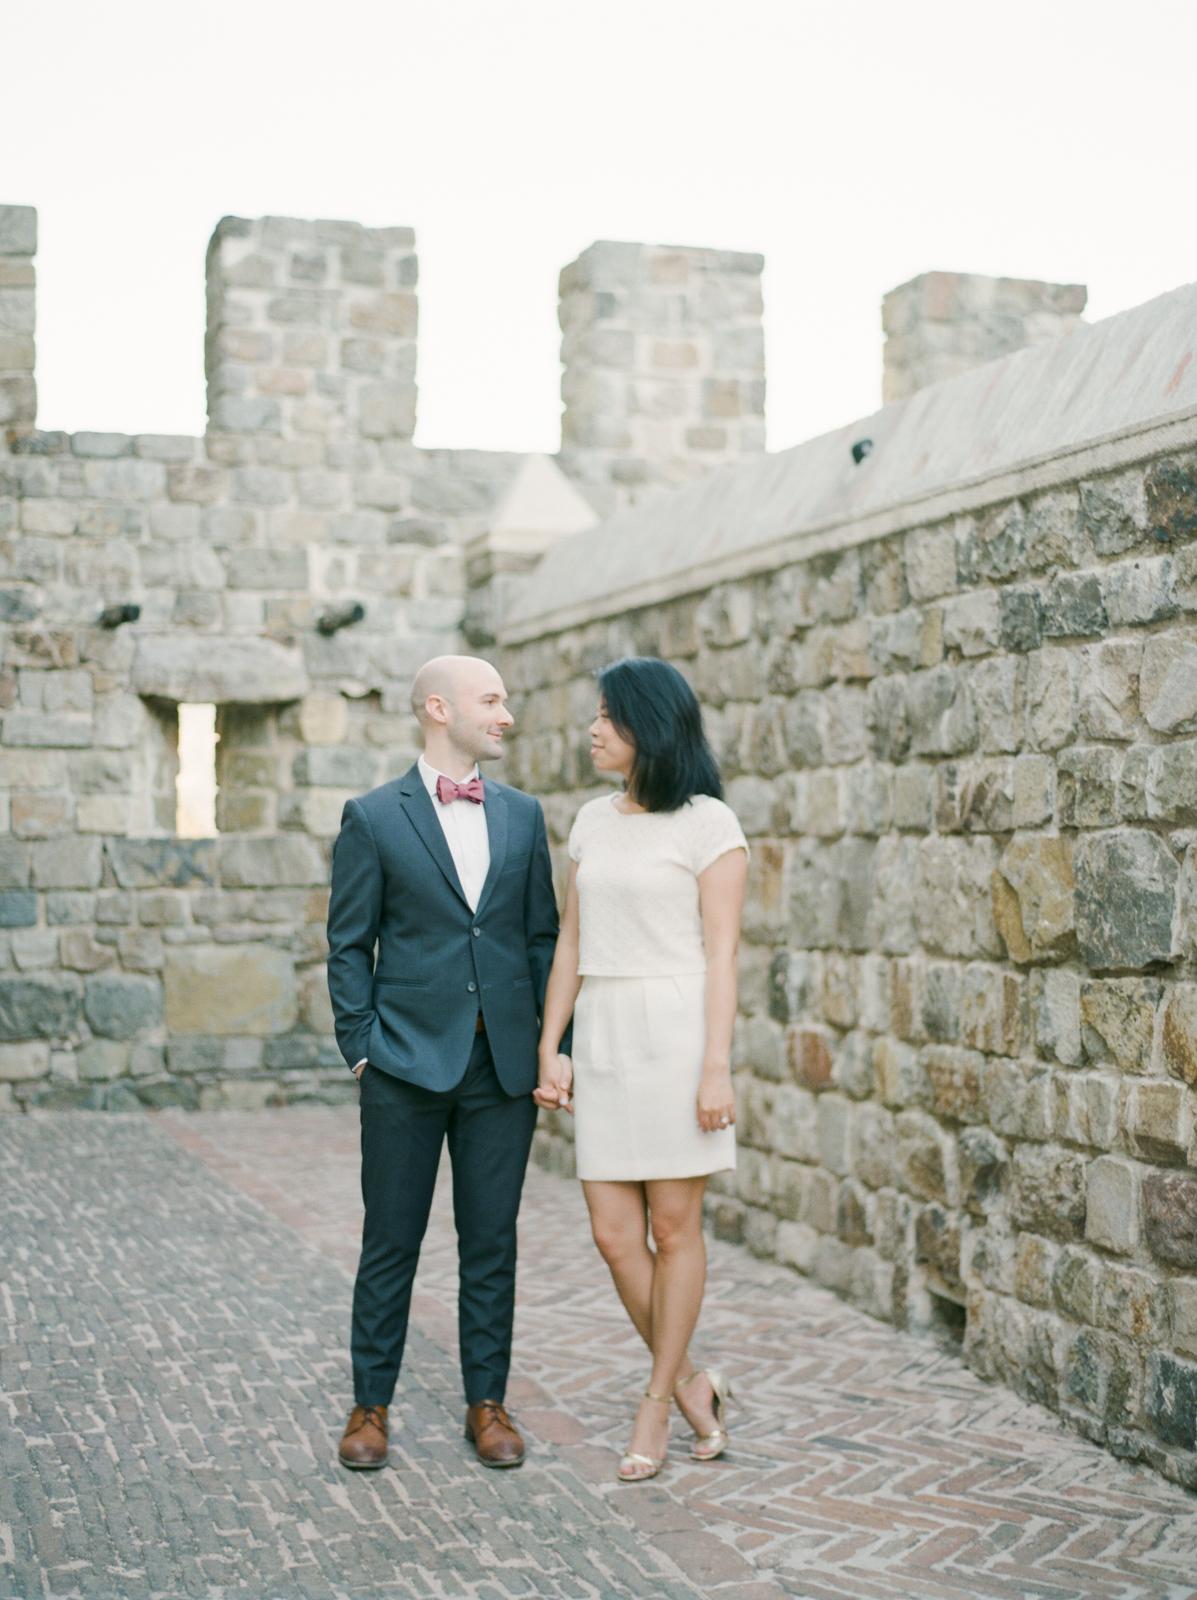 Jenny Soi Photography - WD Napa Engagement websized-30.jpg